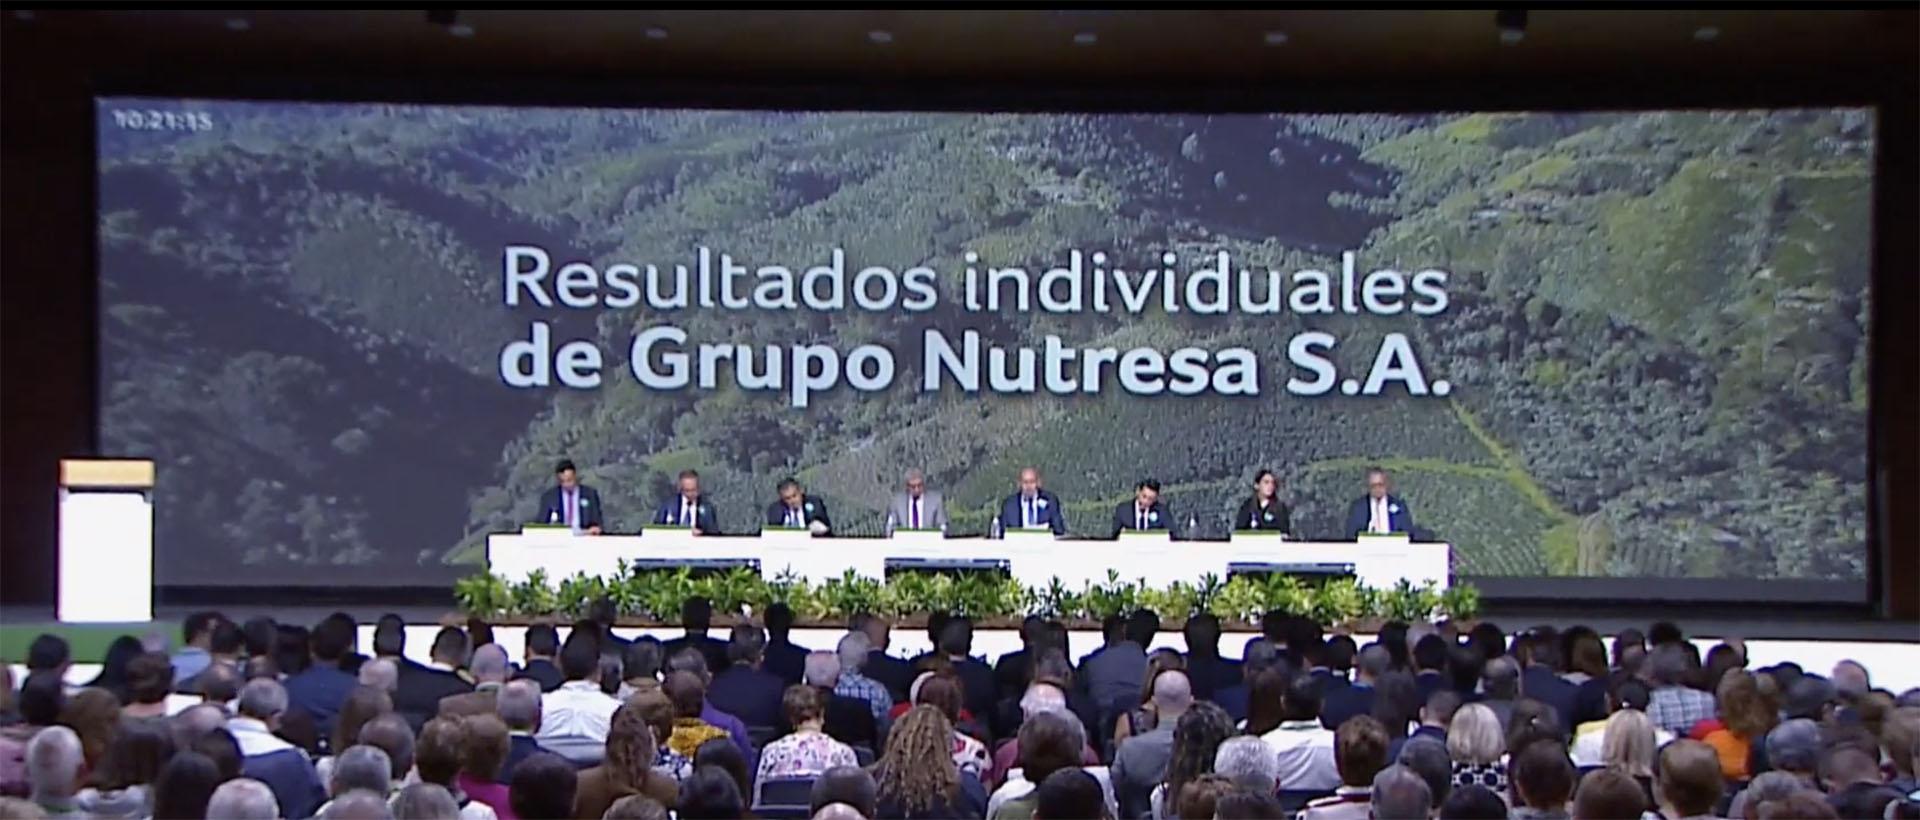 Imagen asamblea de accionistas Grupo Nutresa S.A. gestionada por Xegmenta